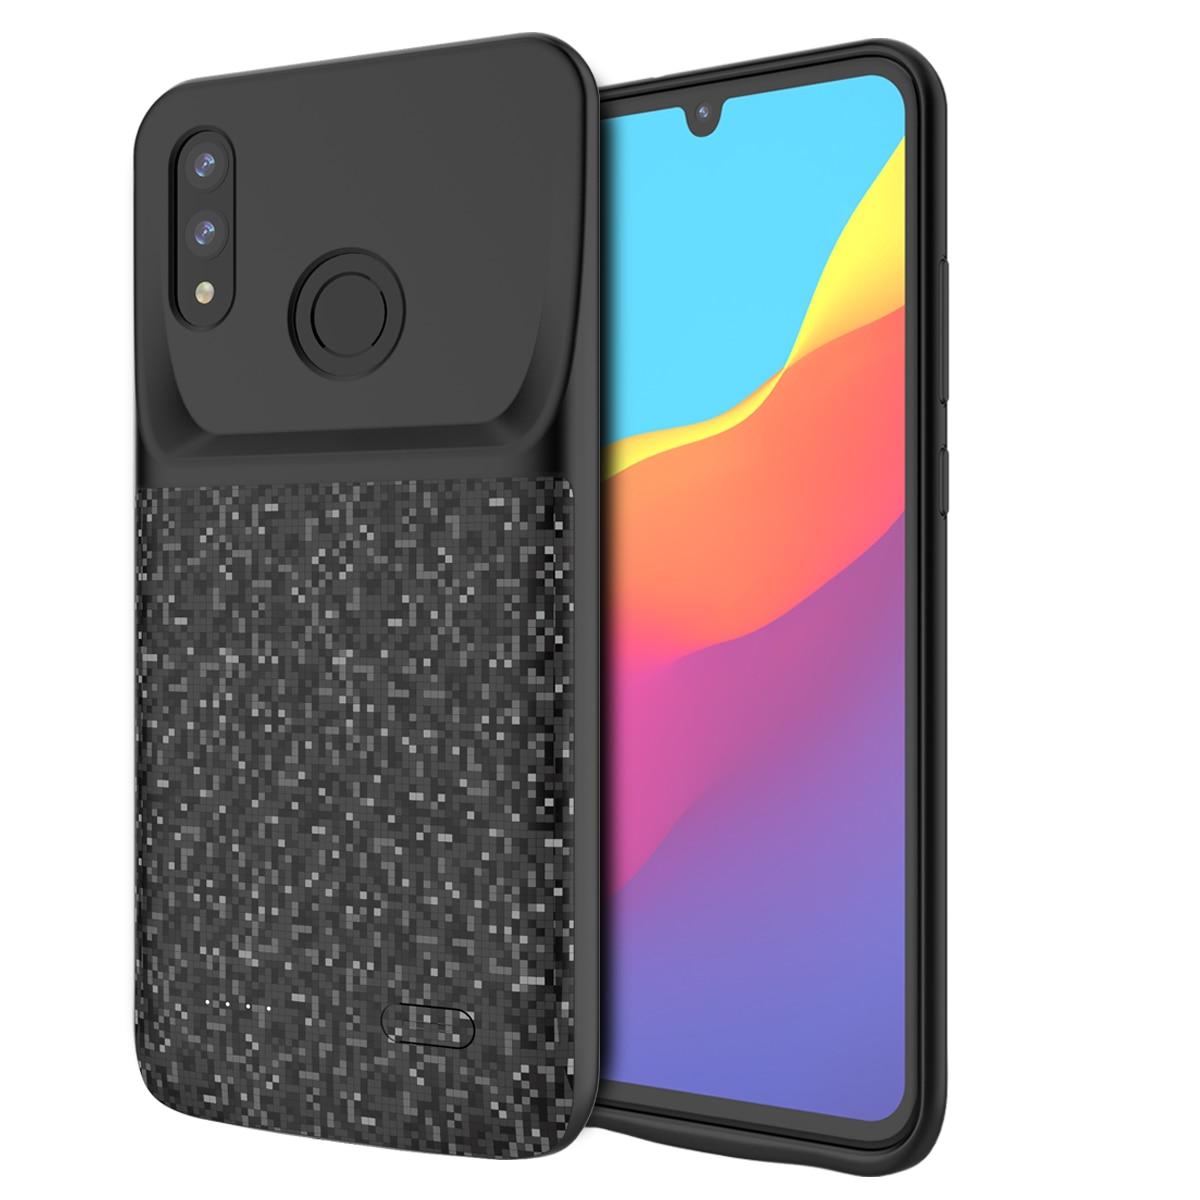 CASEWIN dla Huawei P Smart 2019 ładowarka przypadku 4700mAh